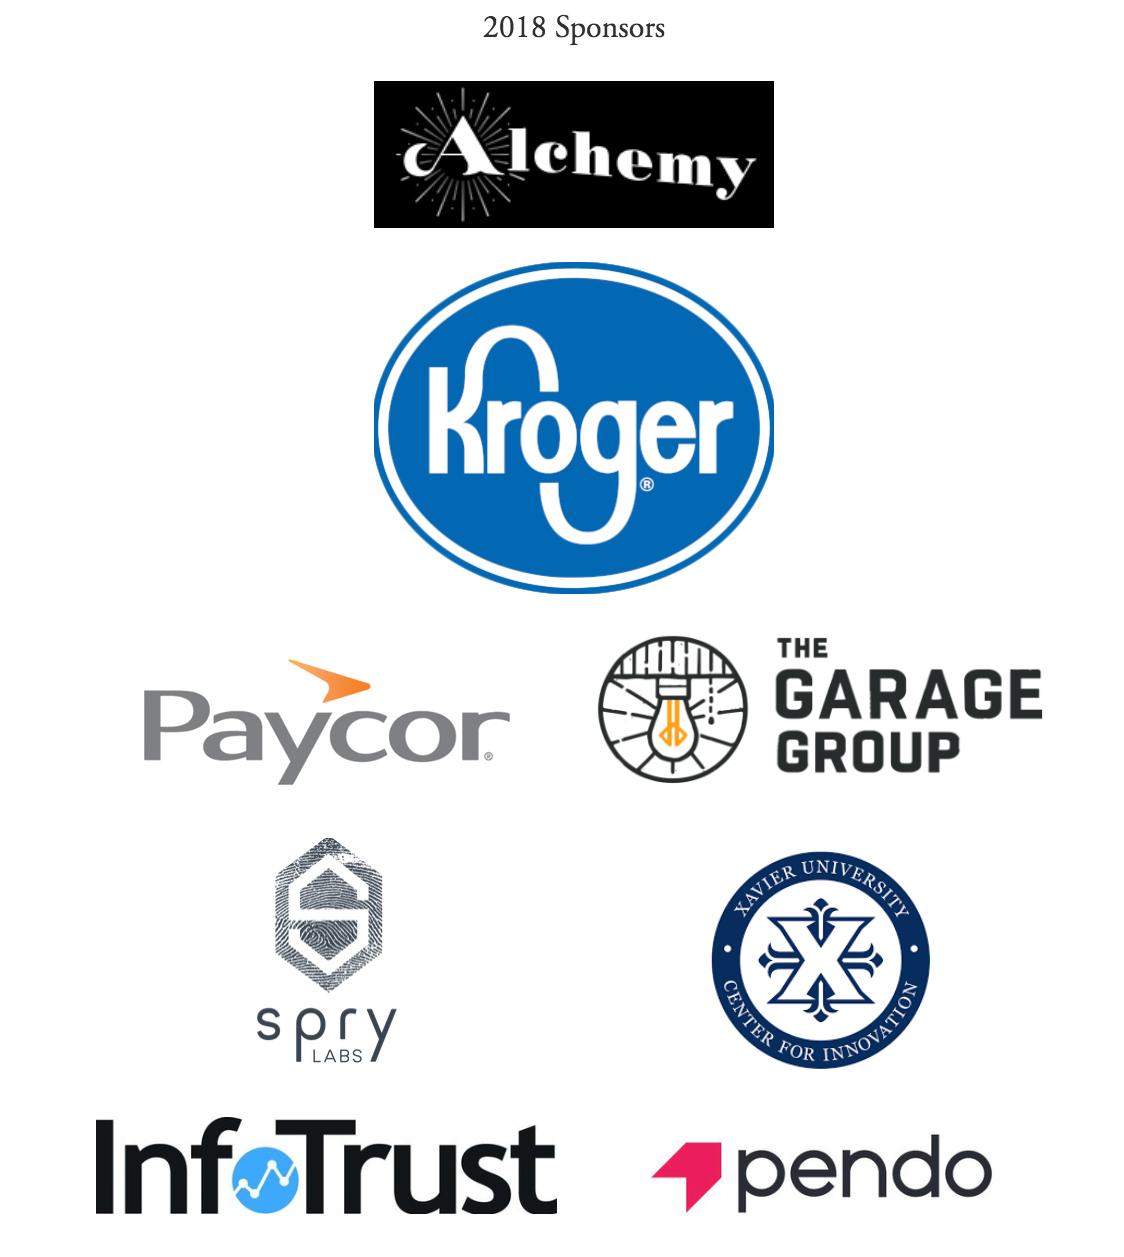 Product Camp Cincinnati 2018 Sponsors